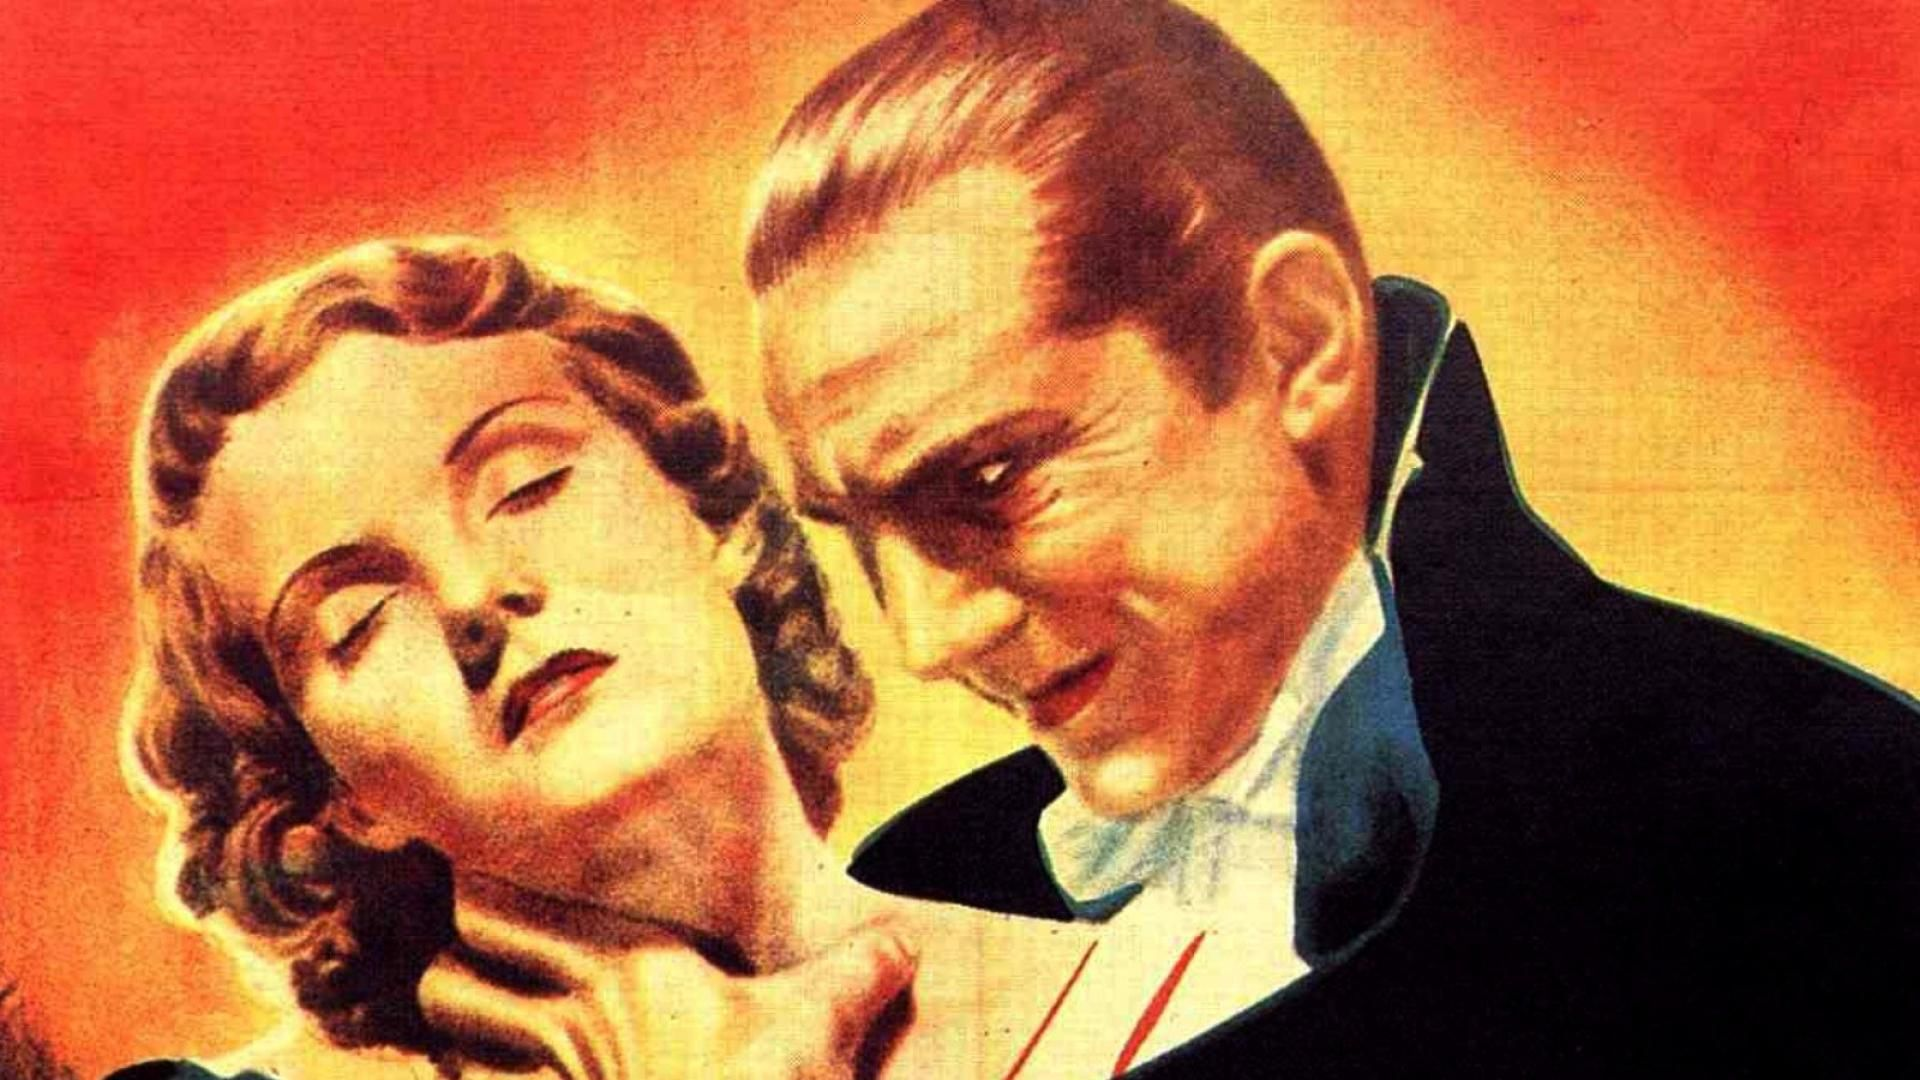 classic cinema wallpaper - photo #23